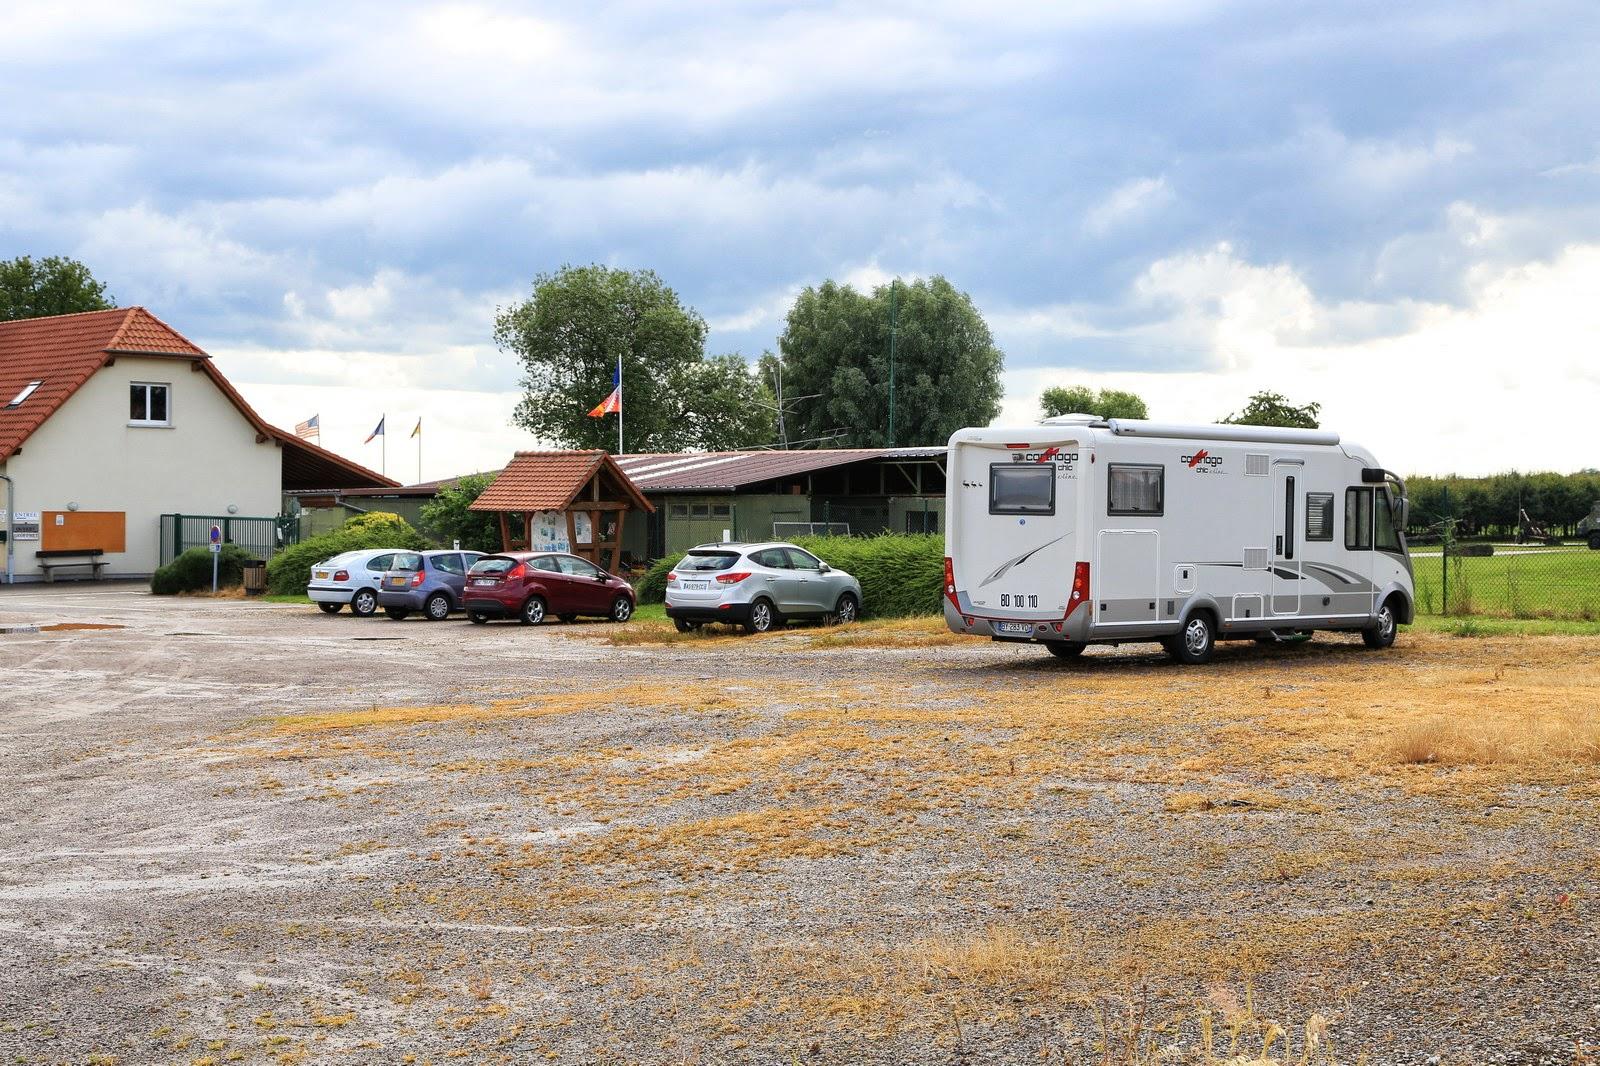 janine guy voyages et montagnes 014 tour de l 39 islande en camping car 6 juillet au 3 ao t 2013. Black Bedroom Furniture Sets. Home Design Ideas